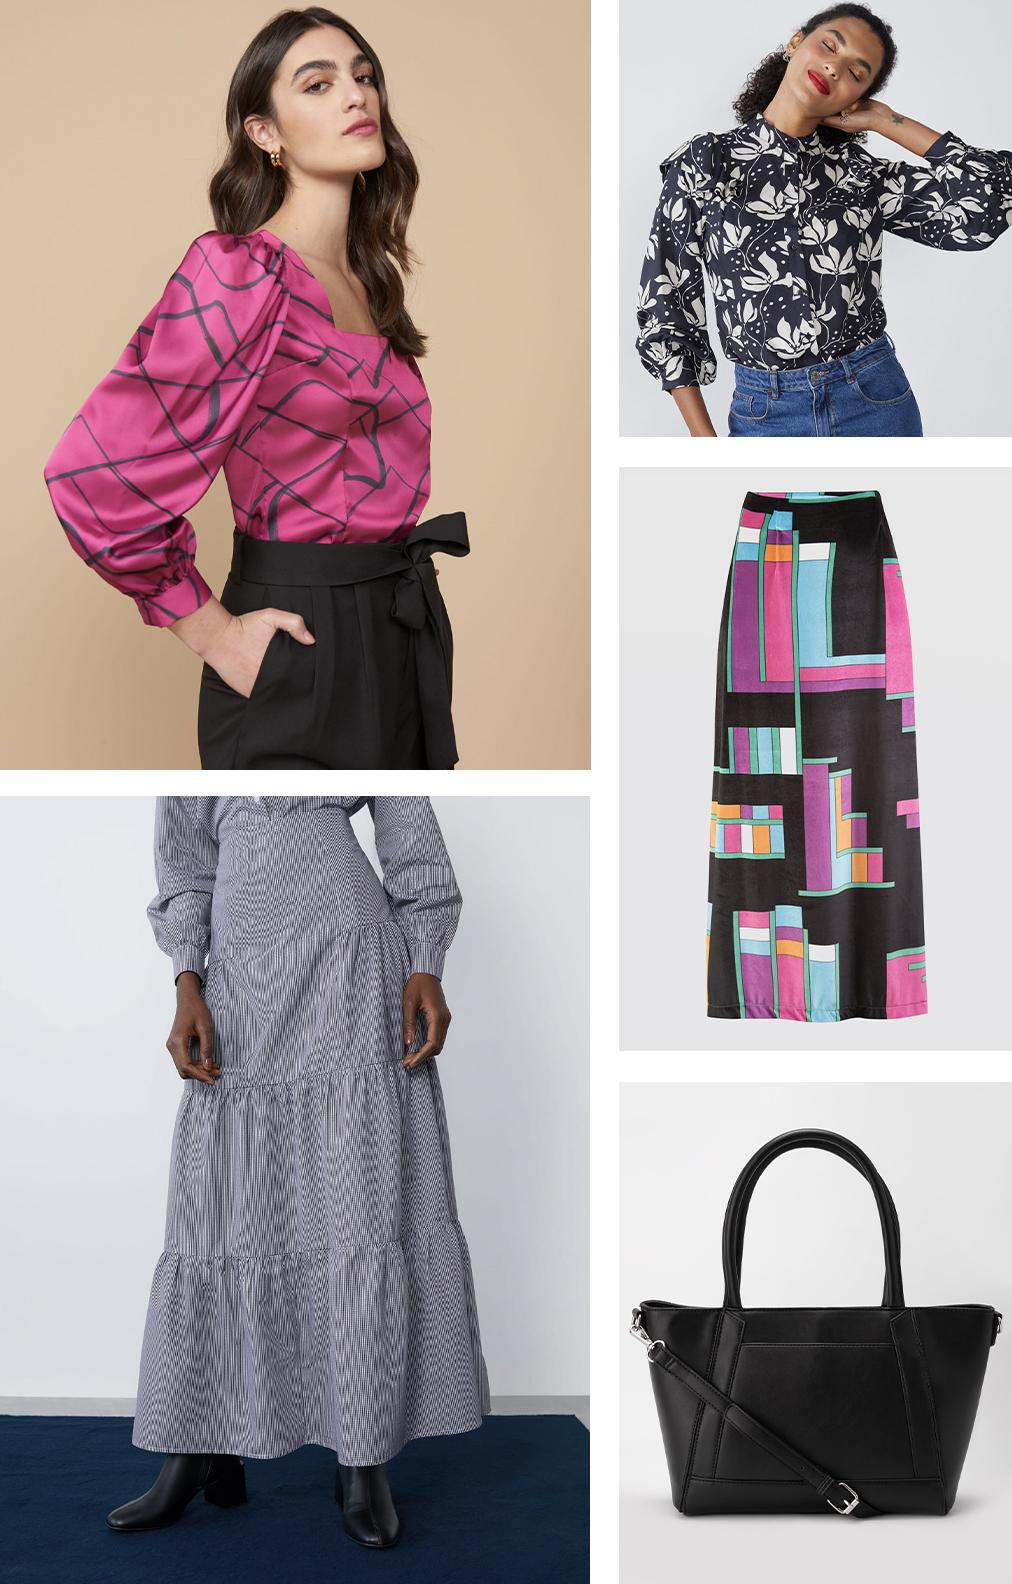 Primeira modelo vestindo blusa manga bufante estampada, segunda modelo vestindo camisa florida, saia estampa geométrica e bolsa tote preta